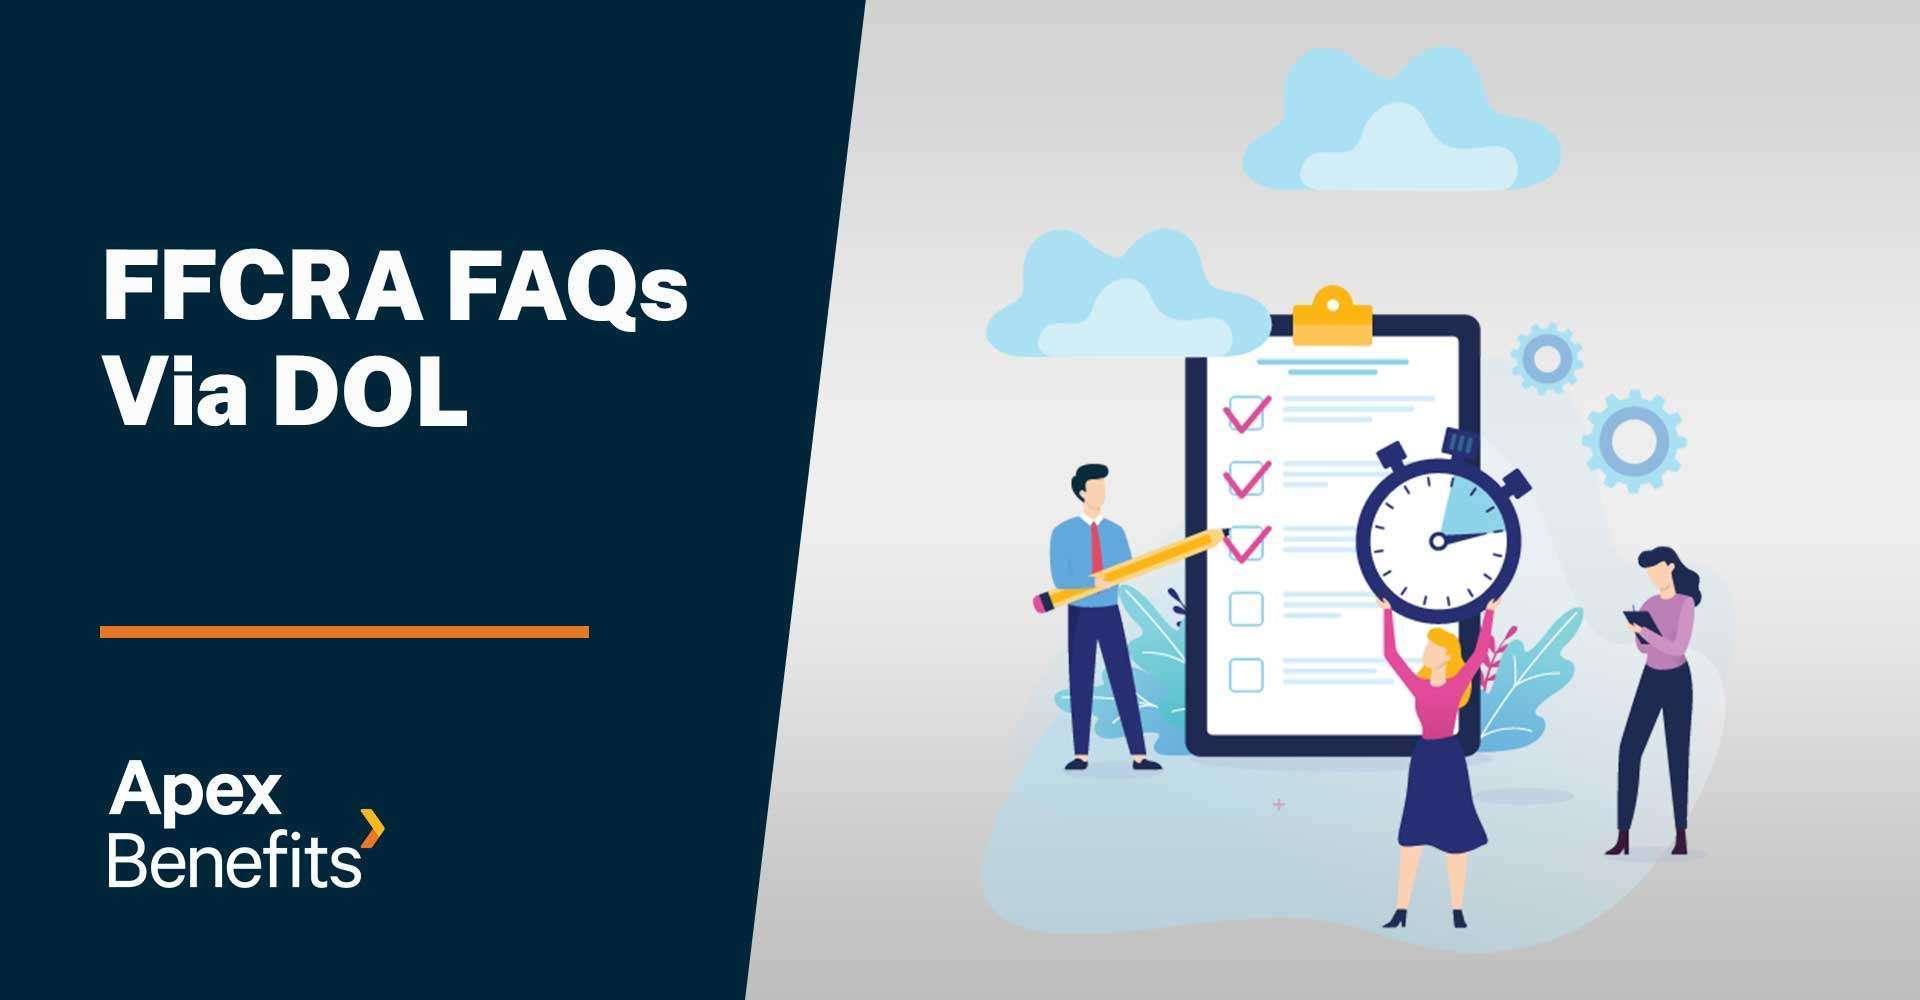 FFCRA FAQs